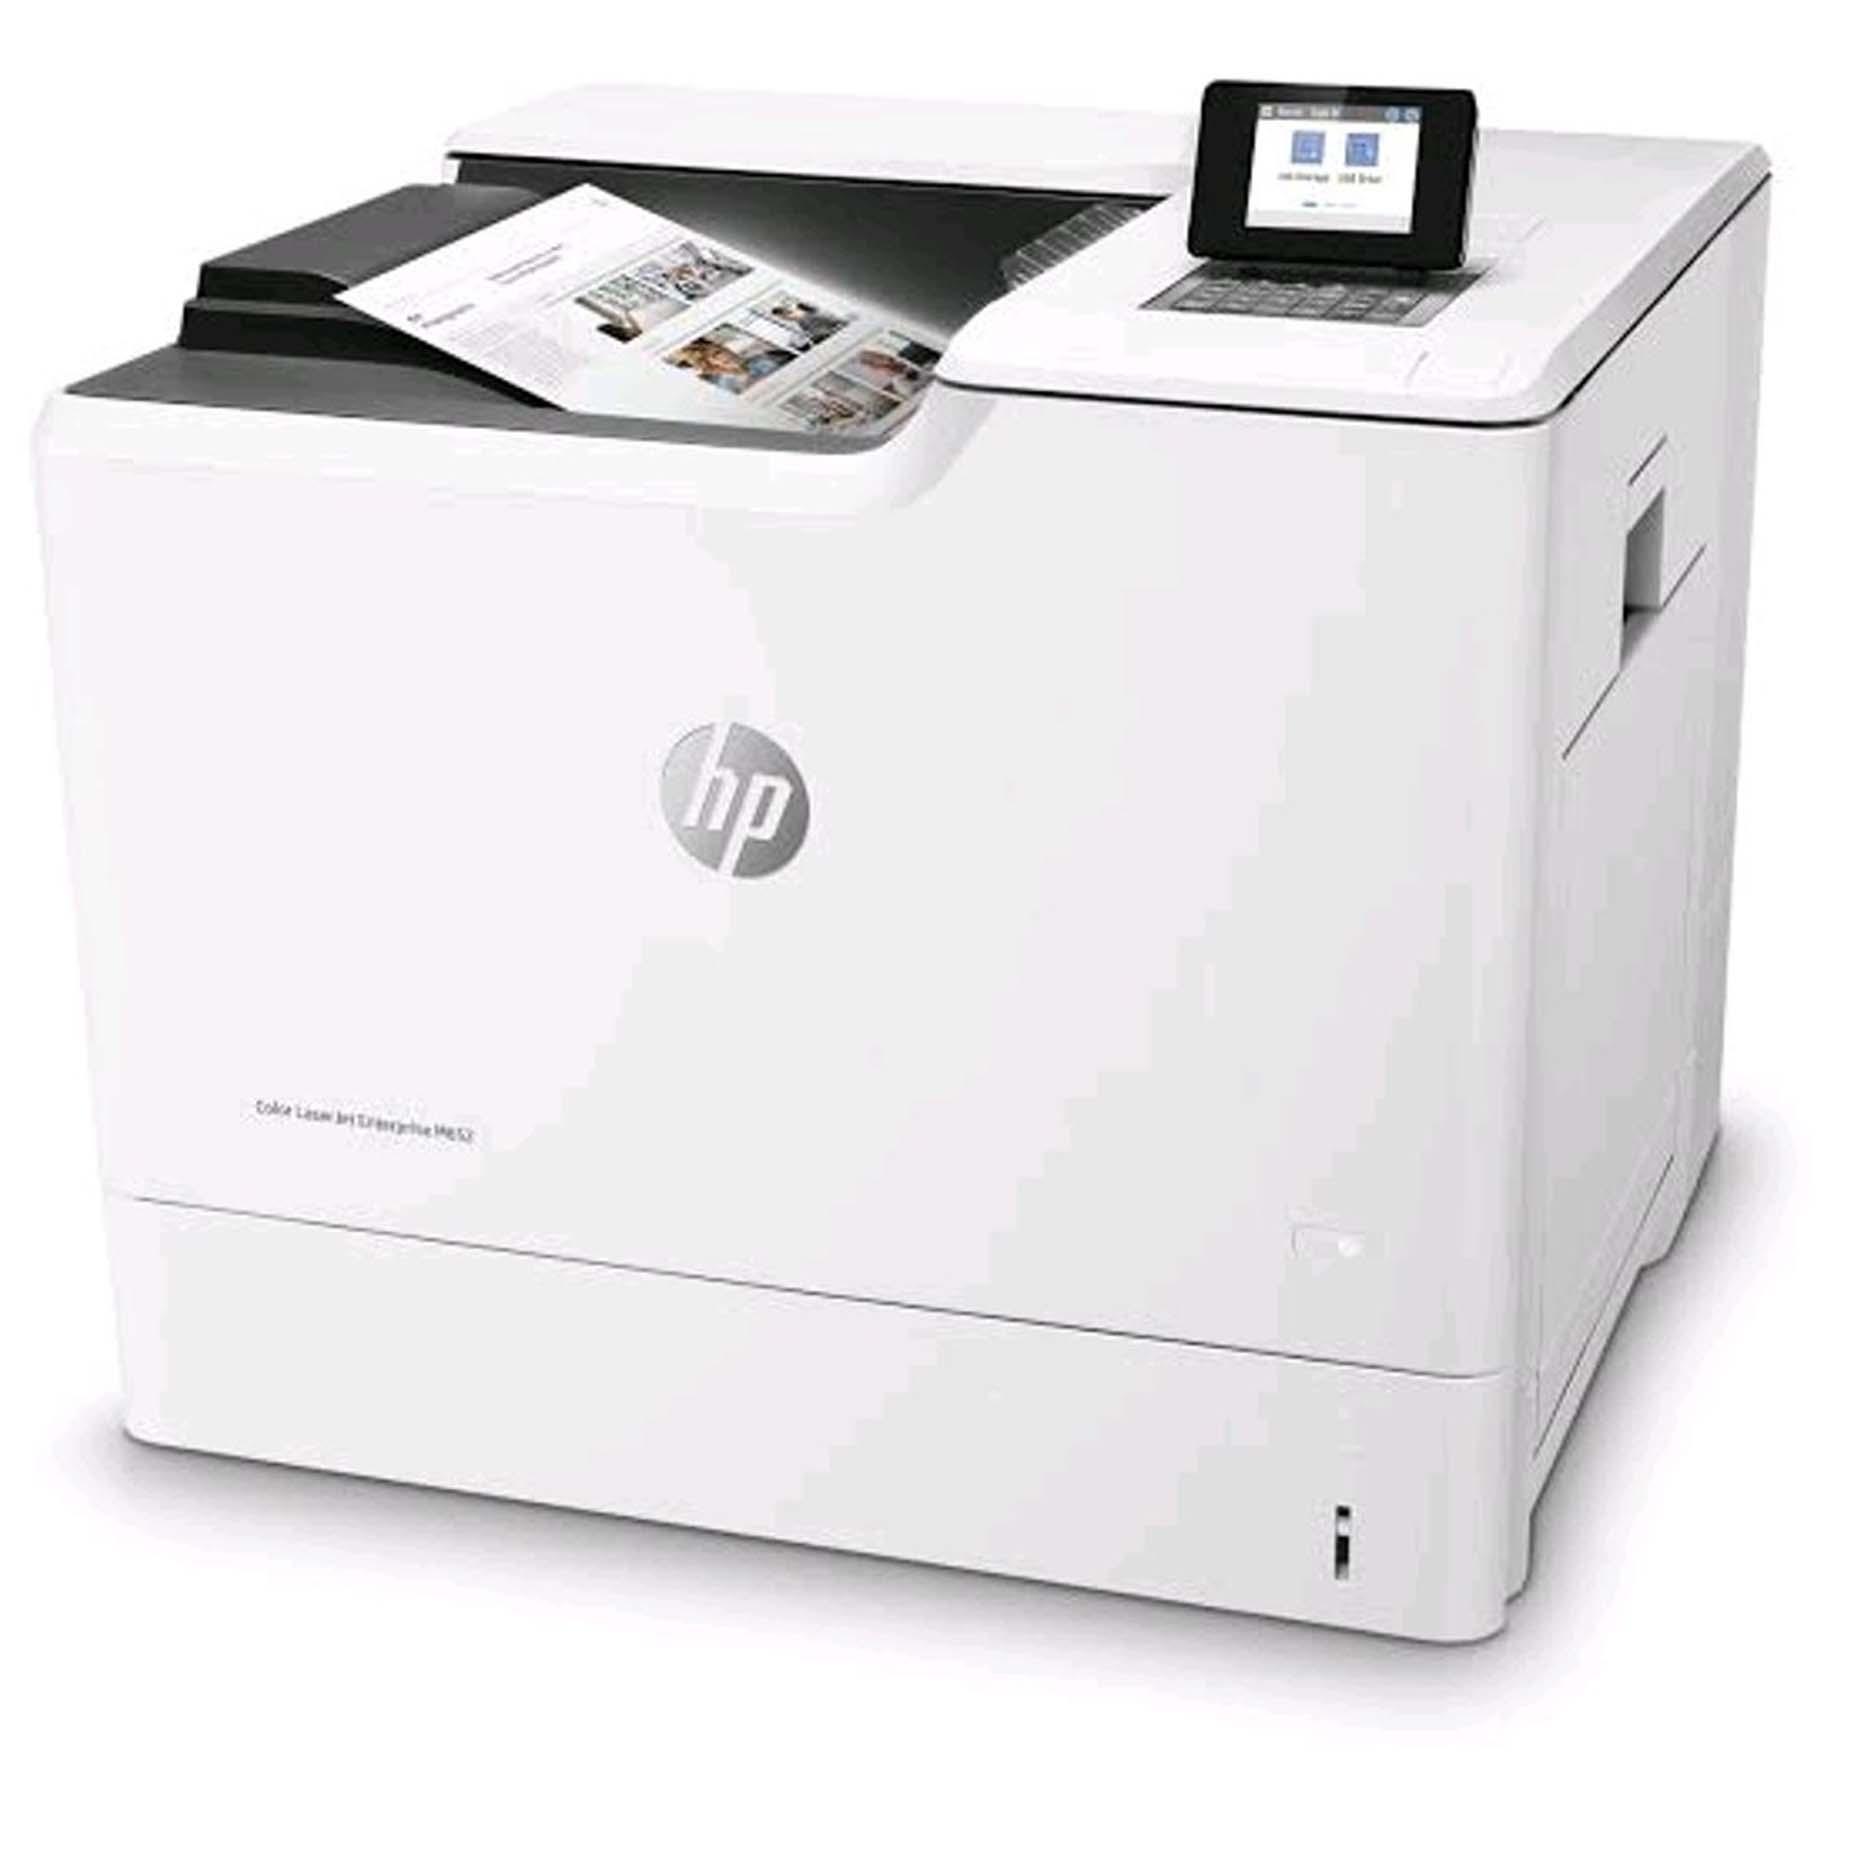 Harga Jual HP Color LaserJet Enterprise M652dn (J7Z99A)